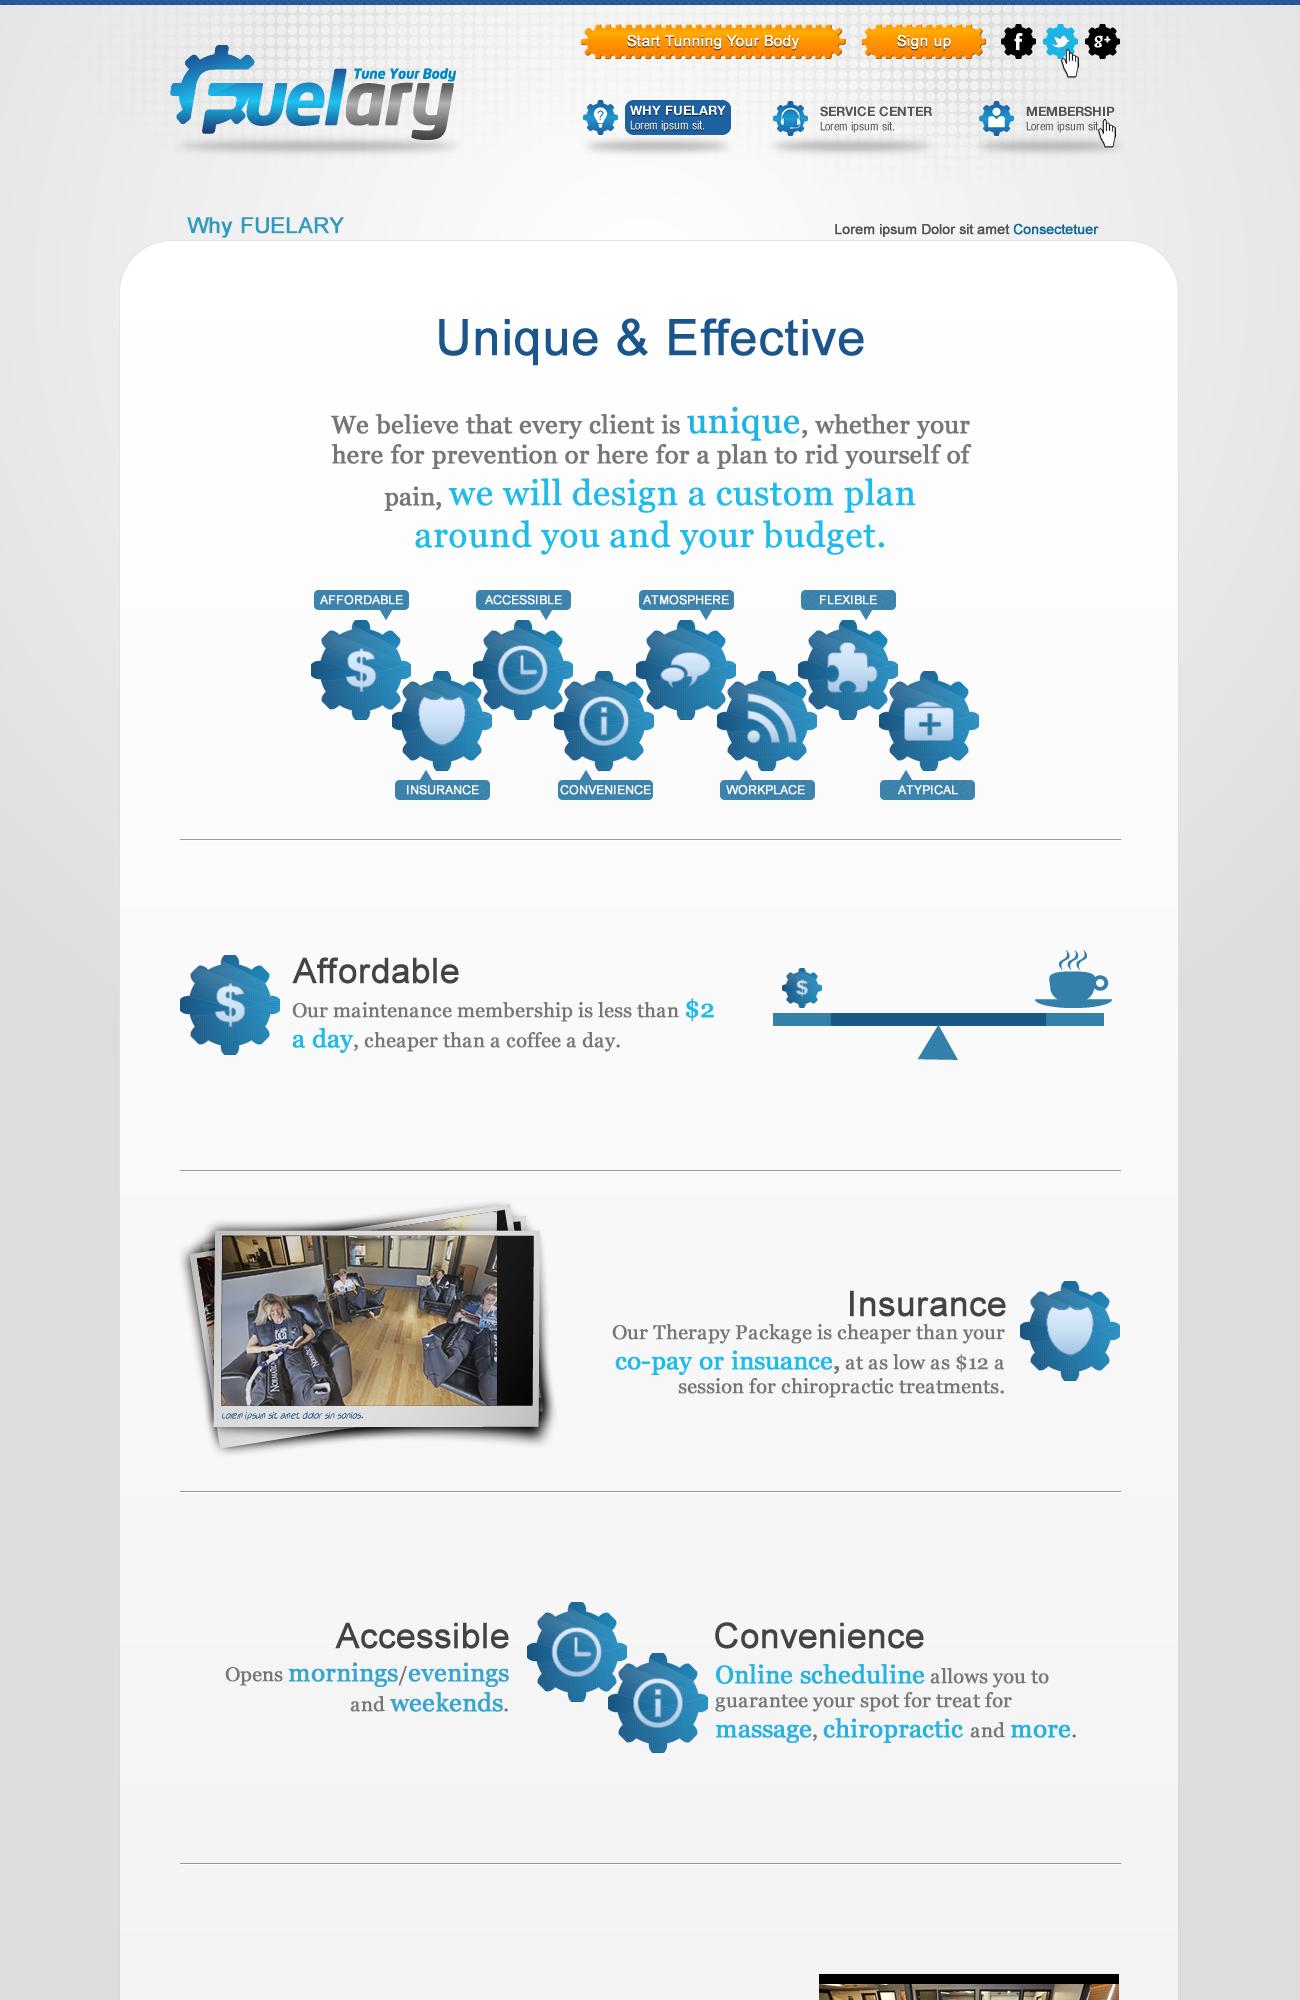 Create the next website design for Fuelary